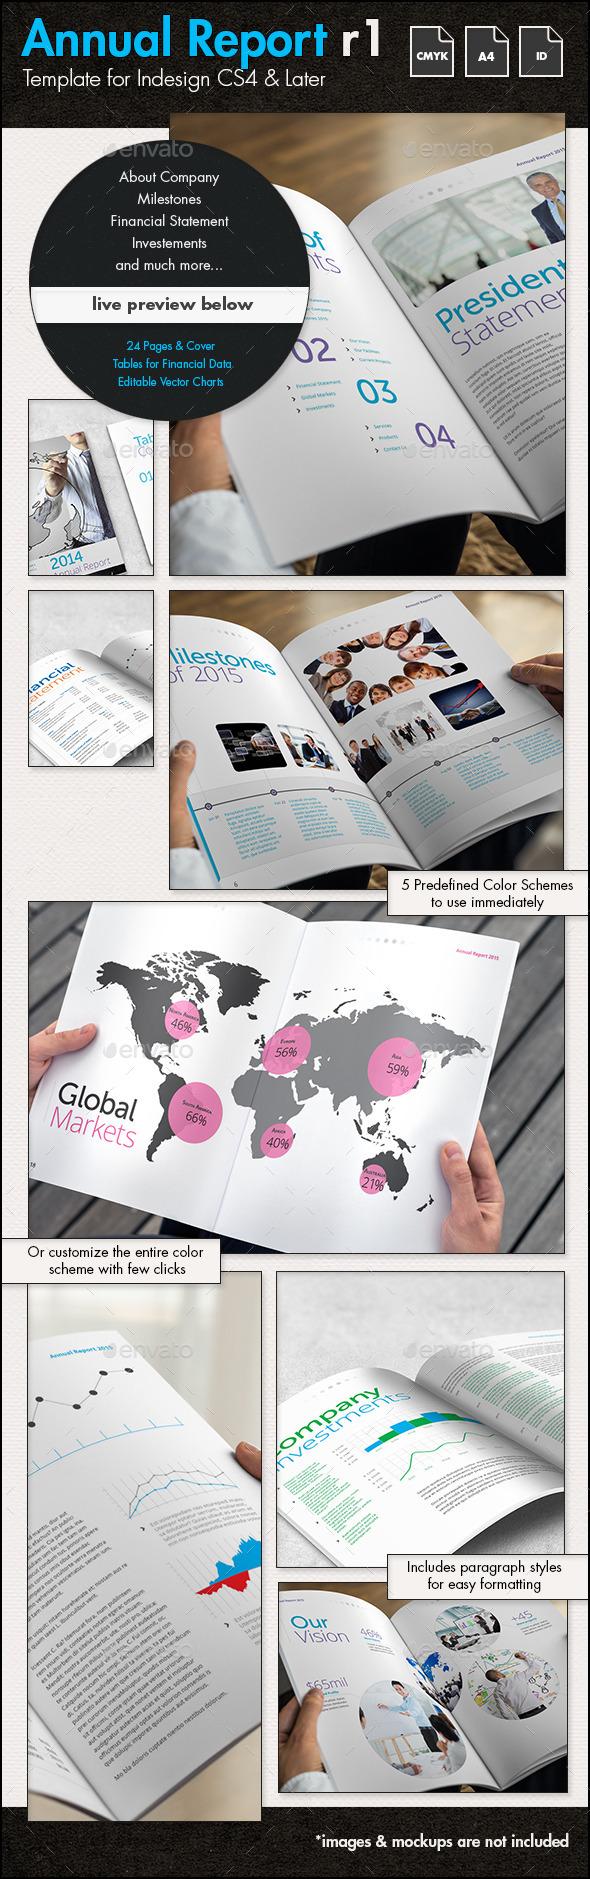 Annual Report r1 Template - A4 Portrait - Corporate Brochures